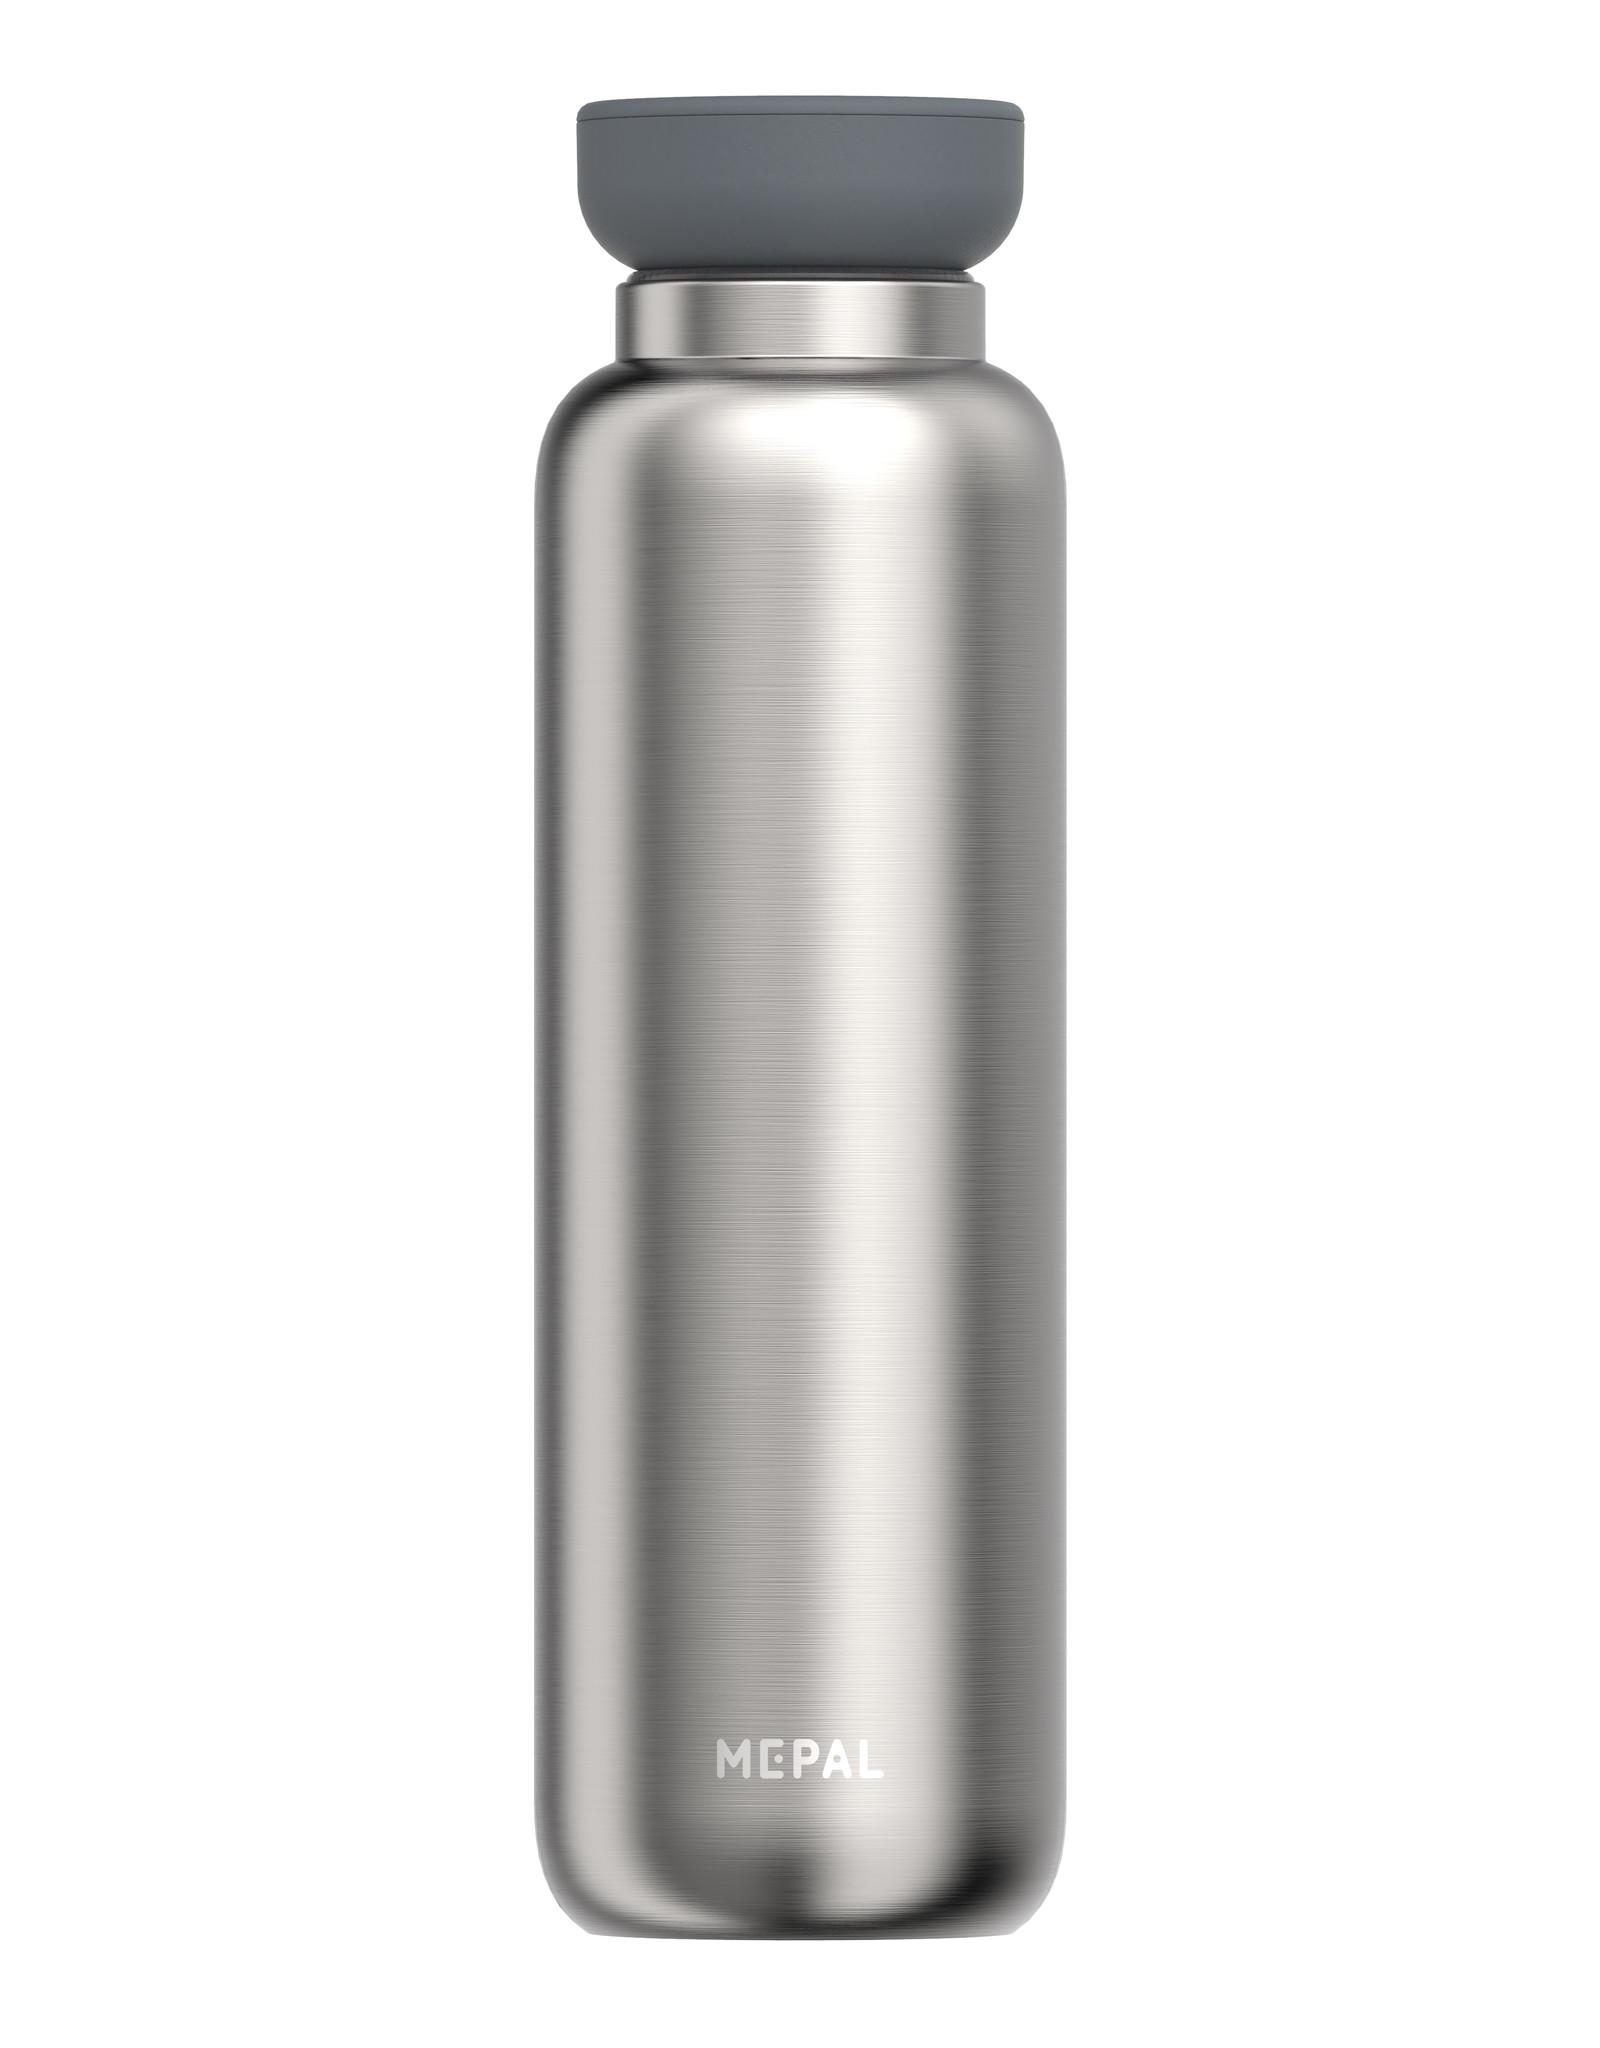 Mepal Isoleerfles ellipse 900 ml - Natural brushed